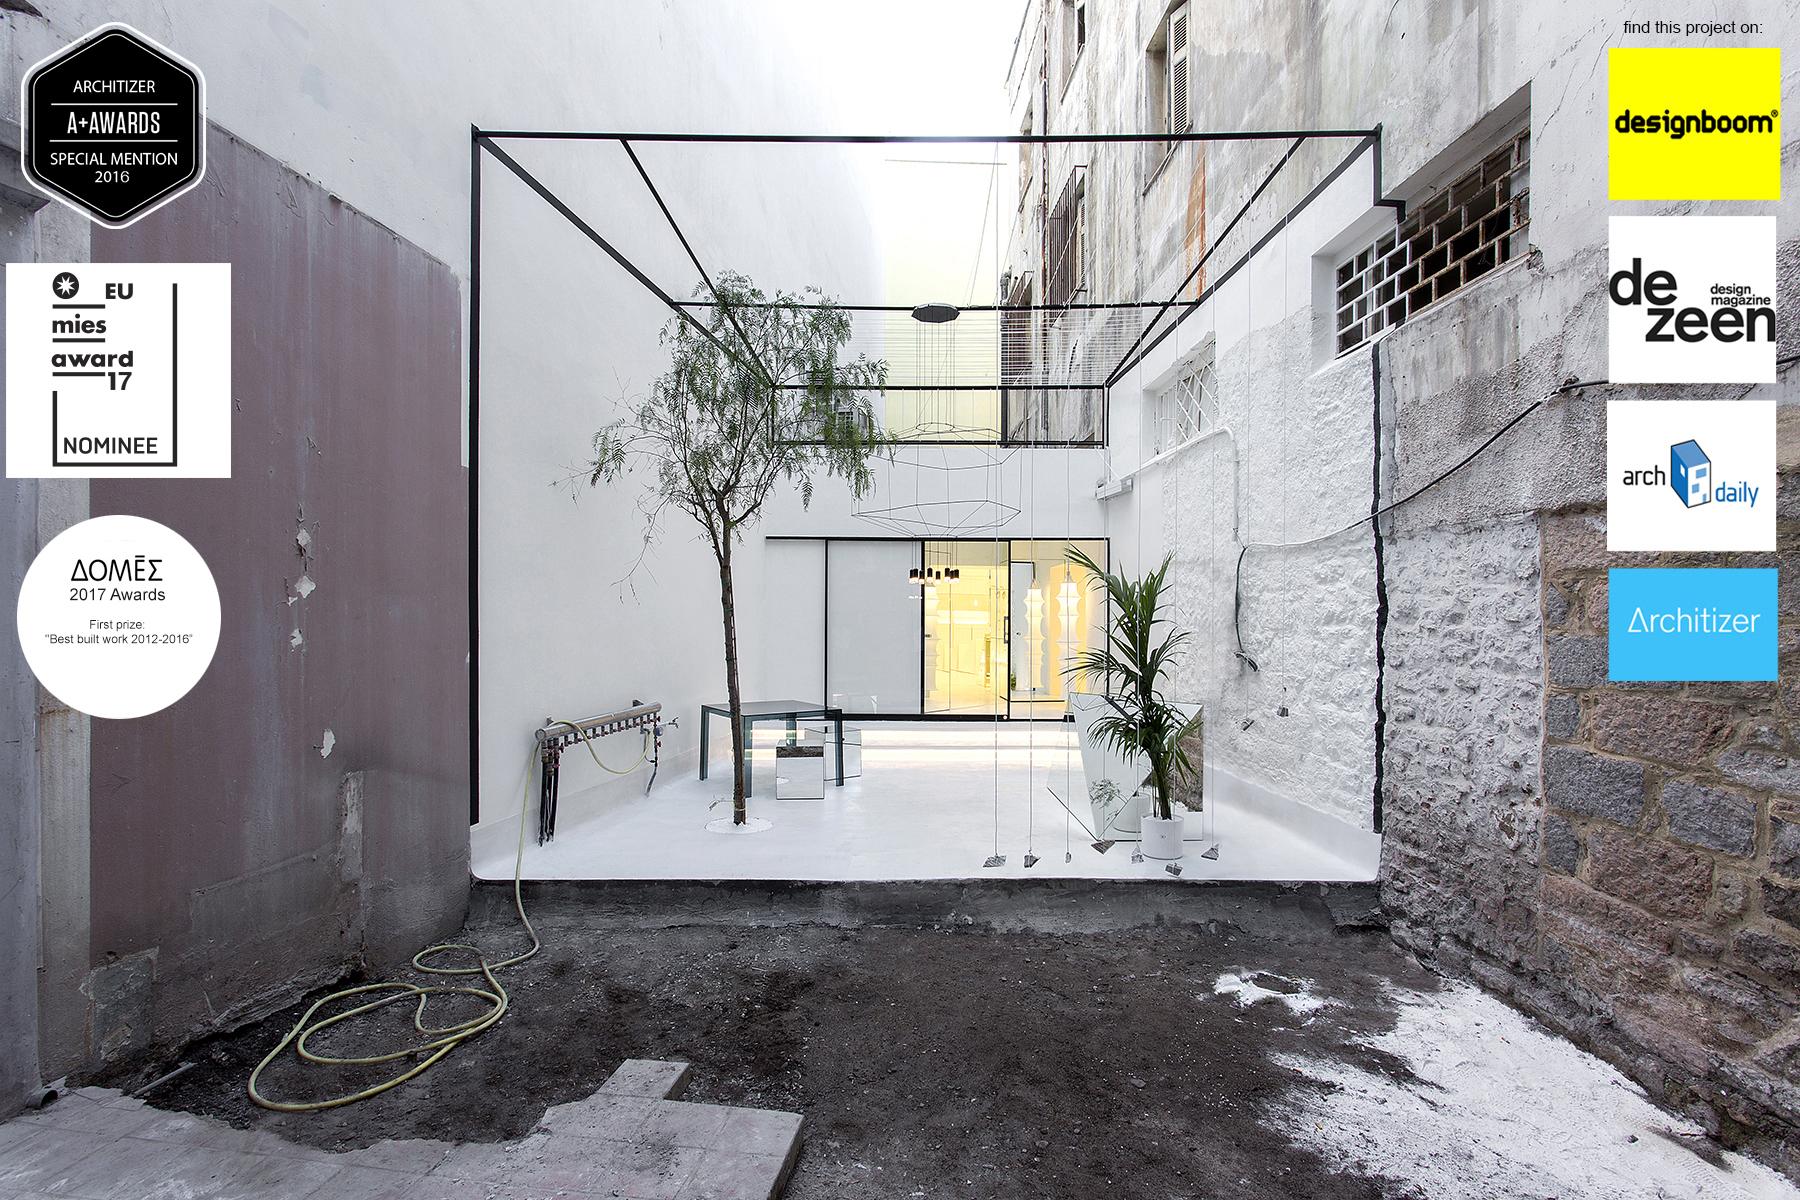 Architecture Studio 314 architecture studio -pavlos chatziangelidis